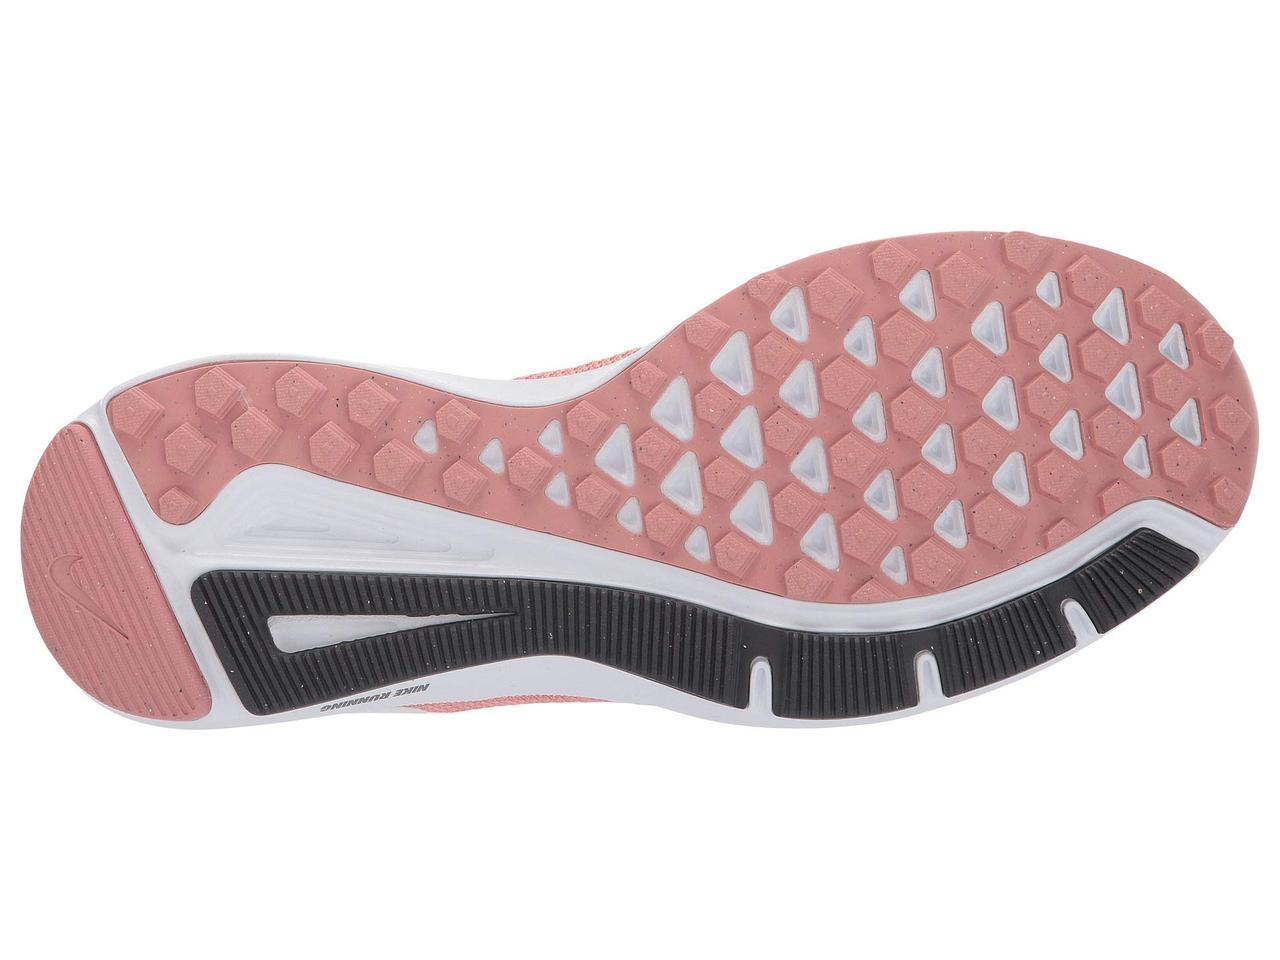 b5657729e0a3 ... Кроссовки Кеды (Оригинал) Nike Quest Rust Pink Summit White Pink Tint  ...